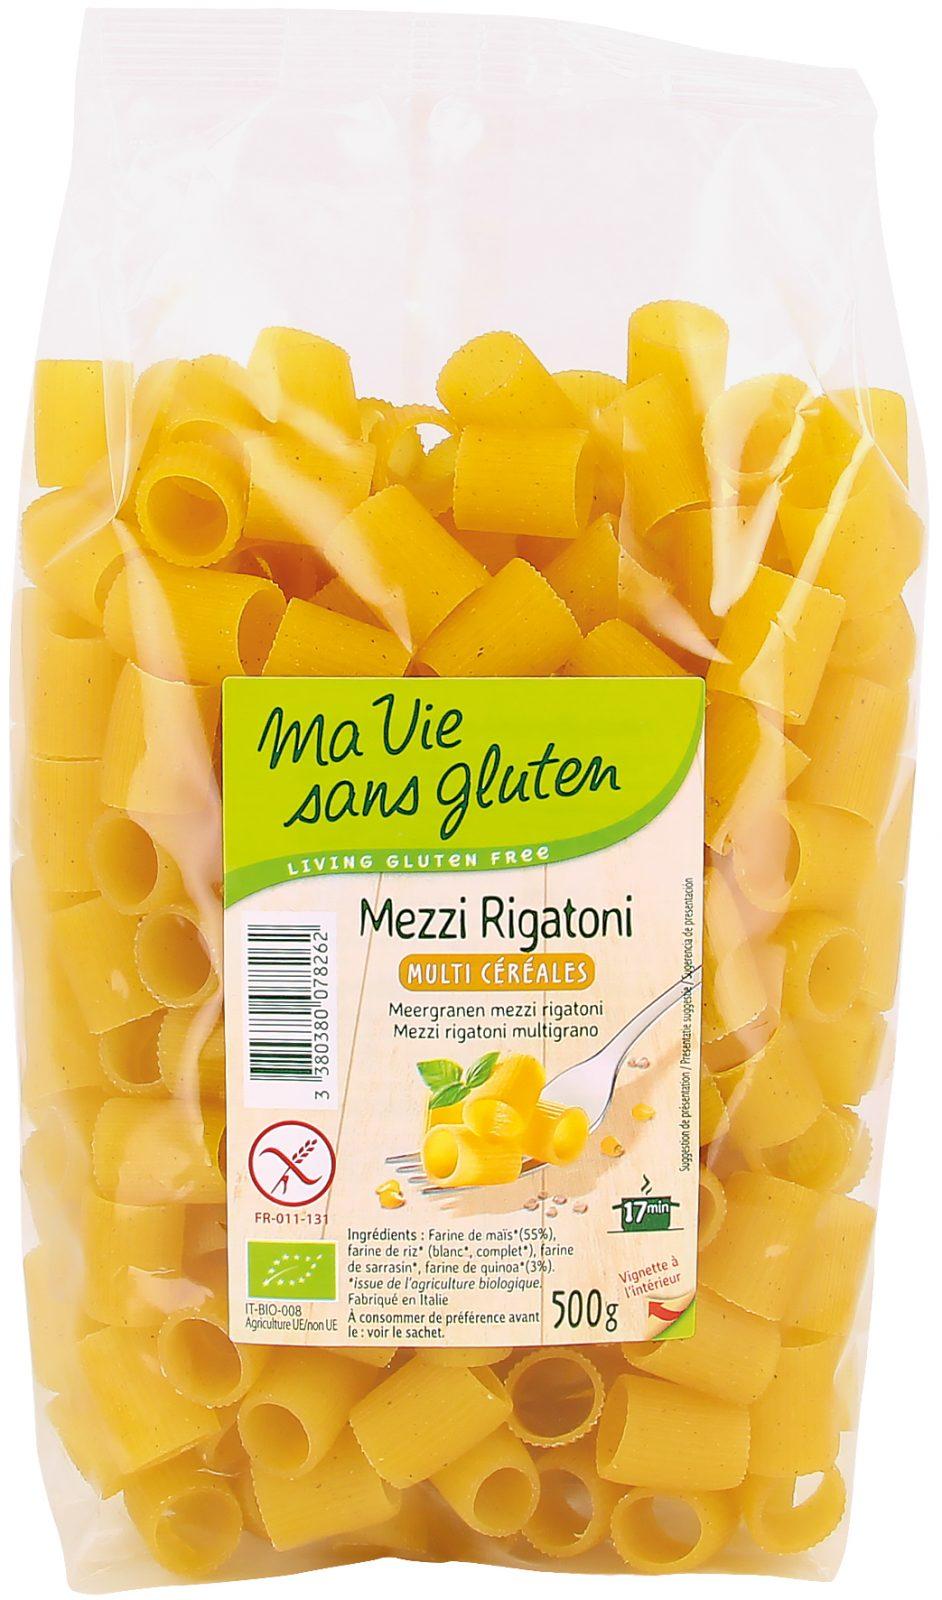 Ma vie sans gluten - Pâte - Mezzi Rigatoni multi céréales - 500g